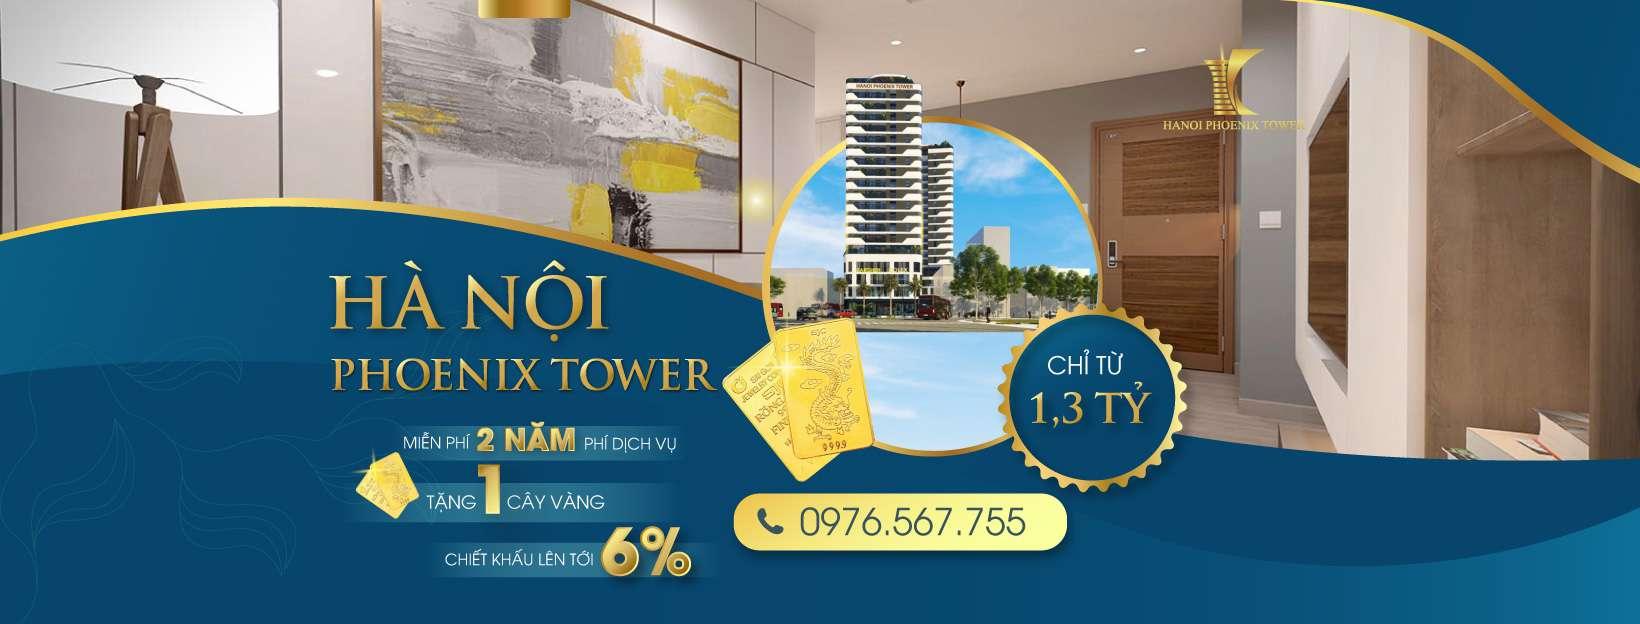 chung cu hanoi phoenix tower